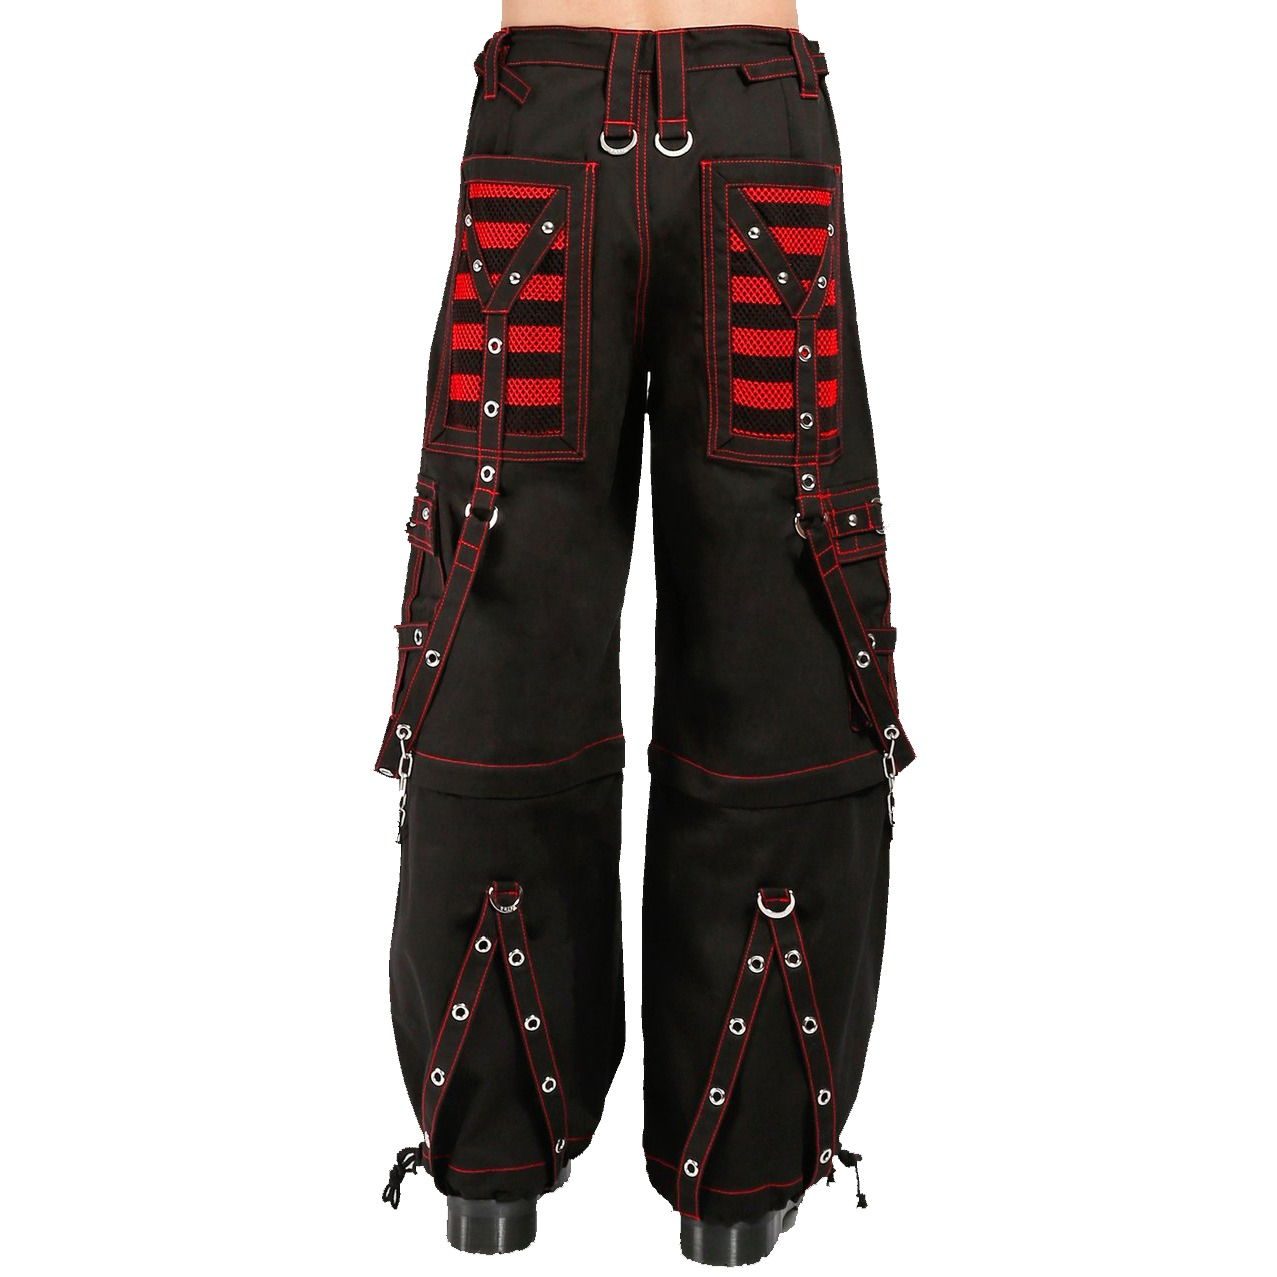 EXTREME BONDAGE SKATER GOTHIC PUNK ROCKER CYBER GOTH BLACK RED STEAMPUNK BIKER TRIPP PANT